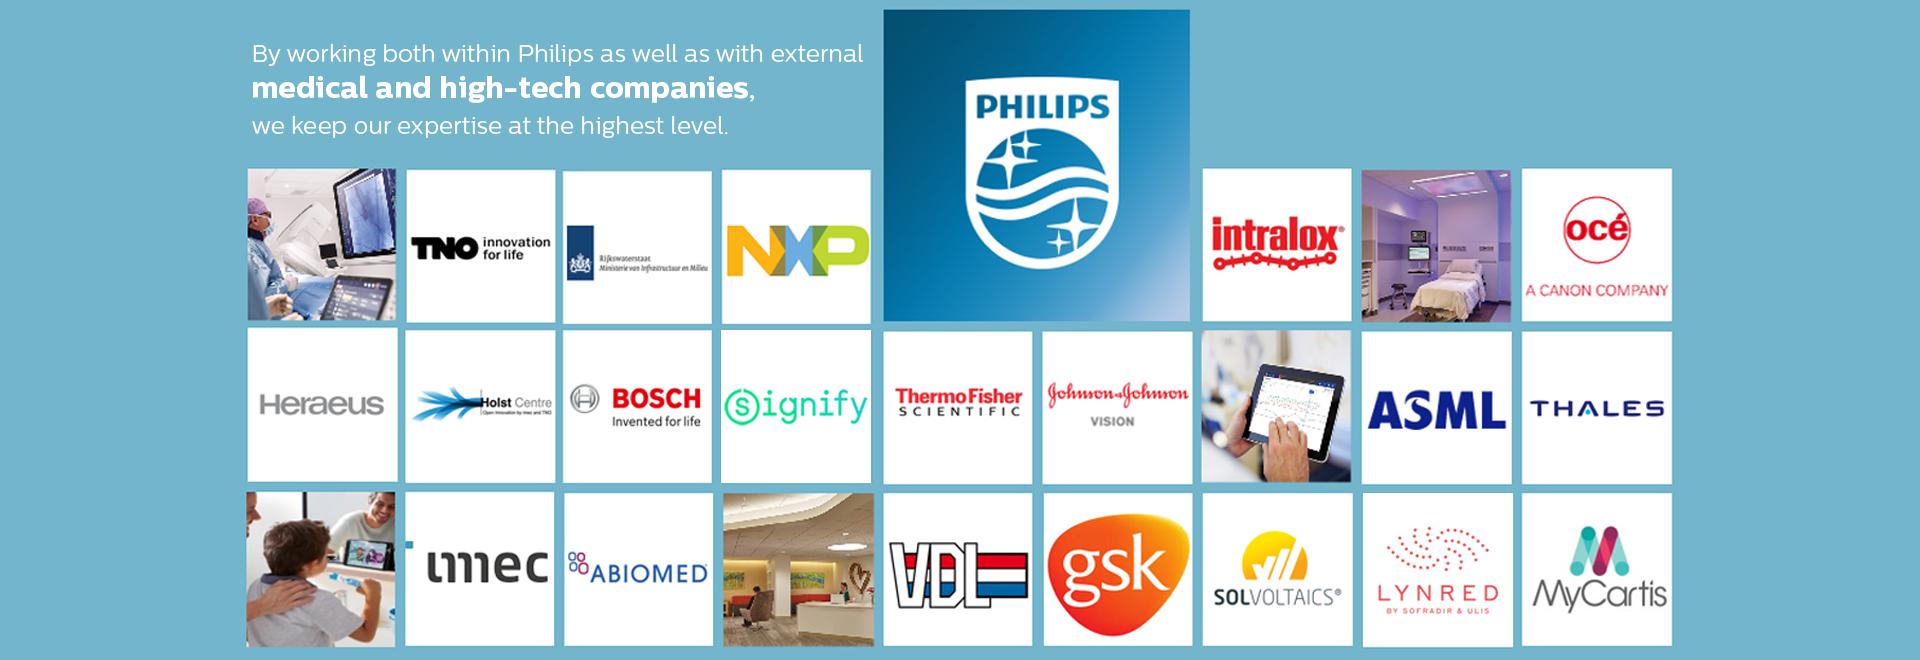 Philips Innovation Services - customer logo's